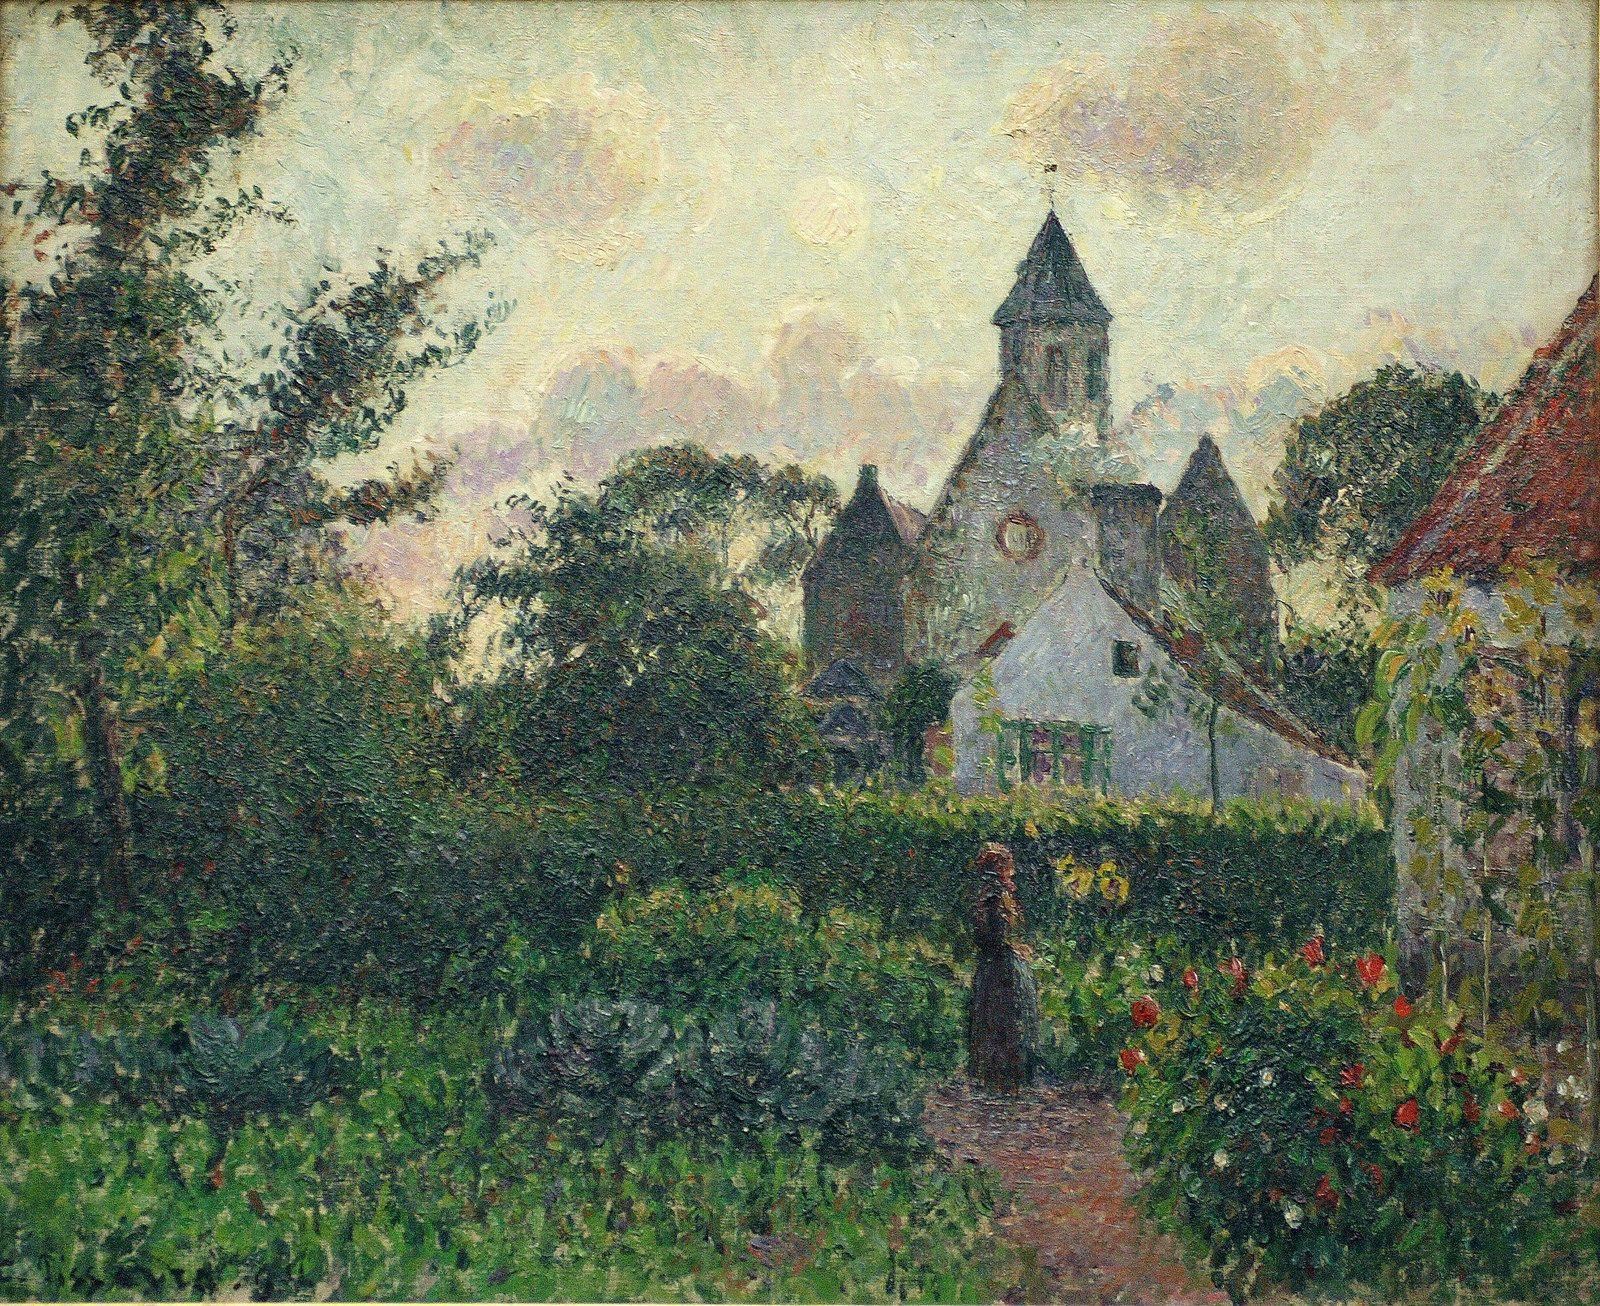 The Church at Knocke, 1894. Camille Pissarro